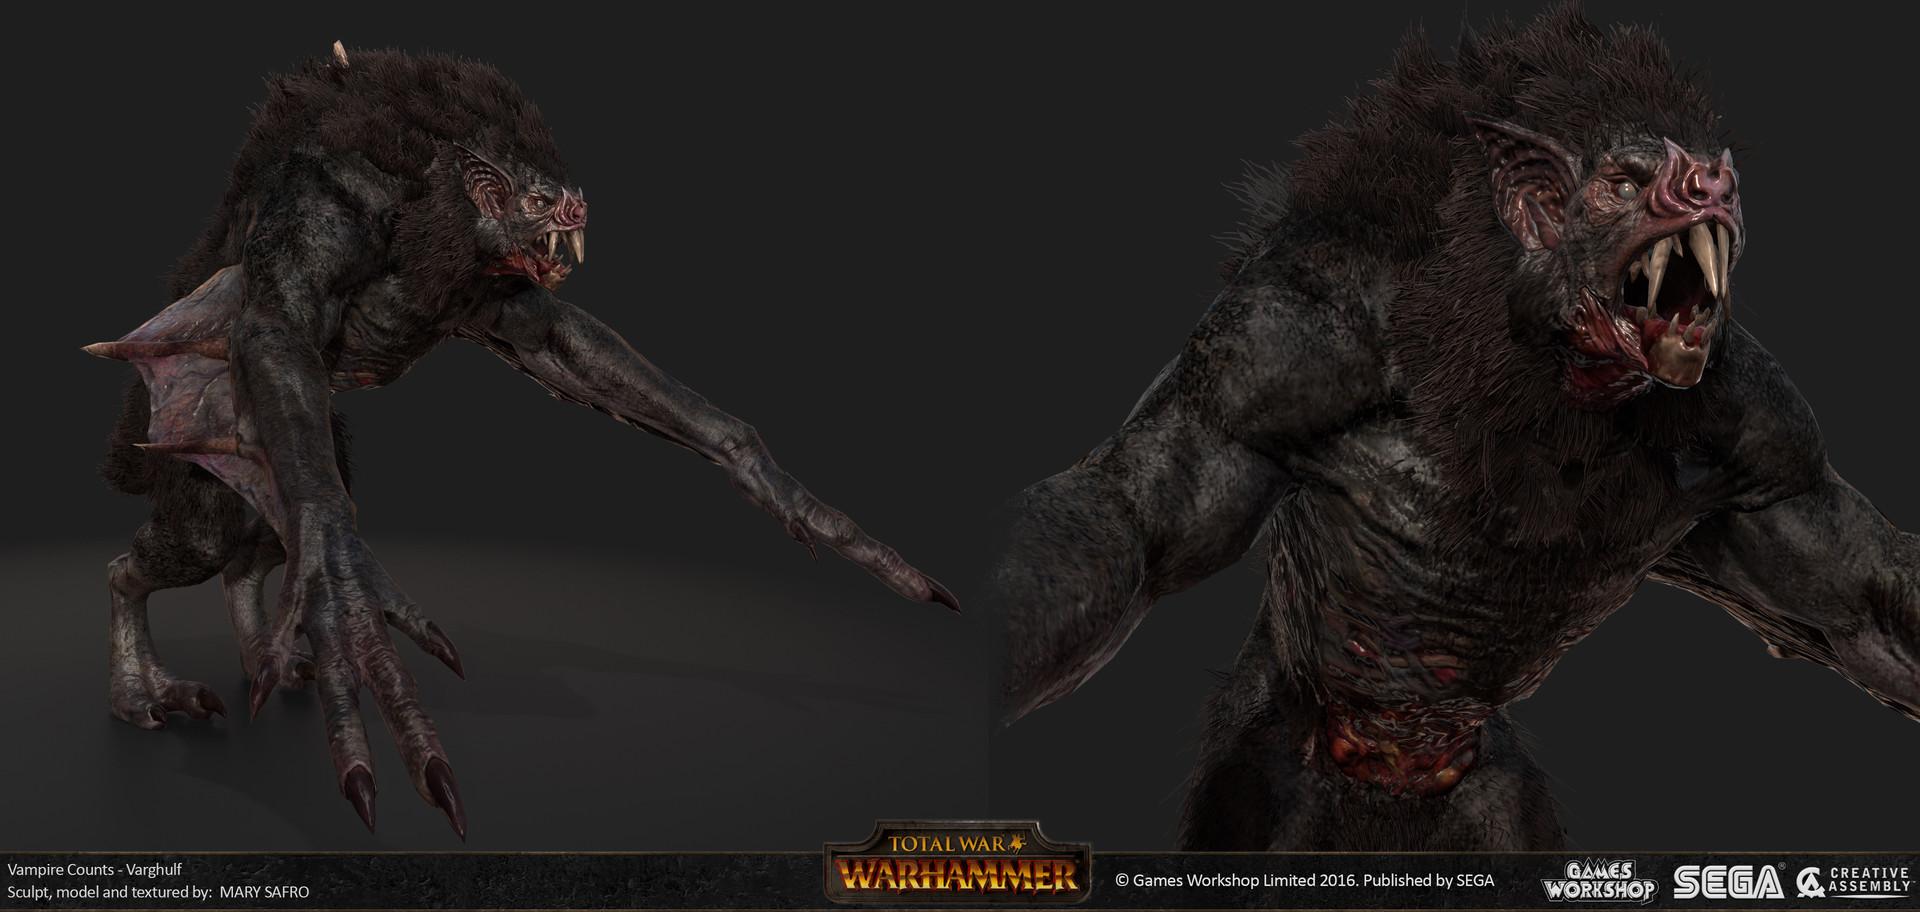 ArtStation - Total War: Warhammer, Mary Safro